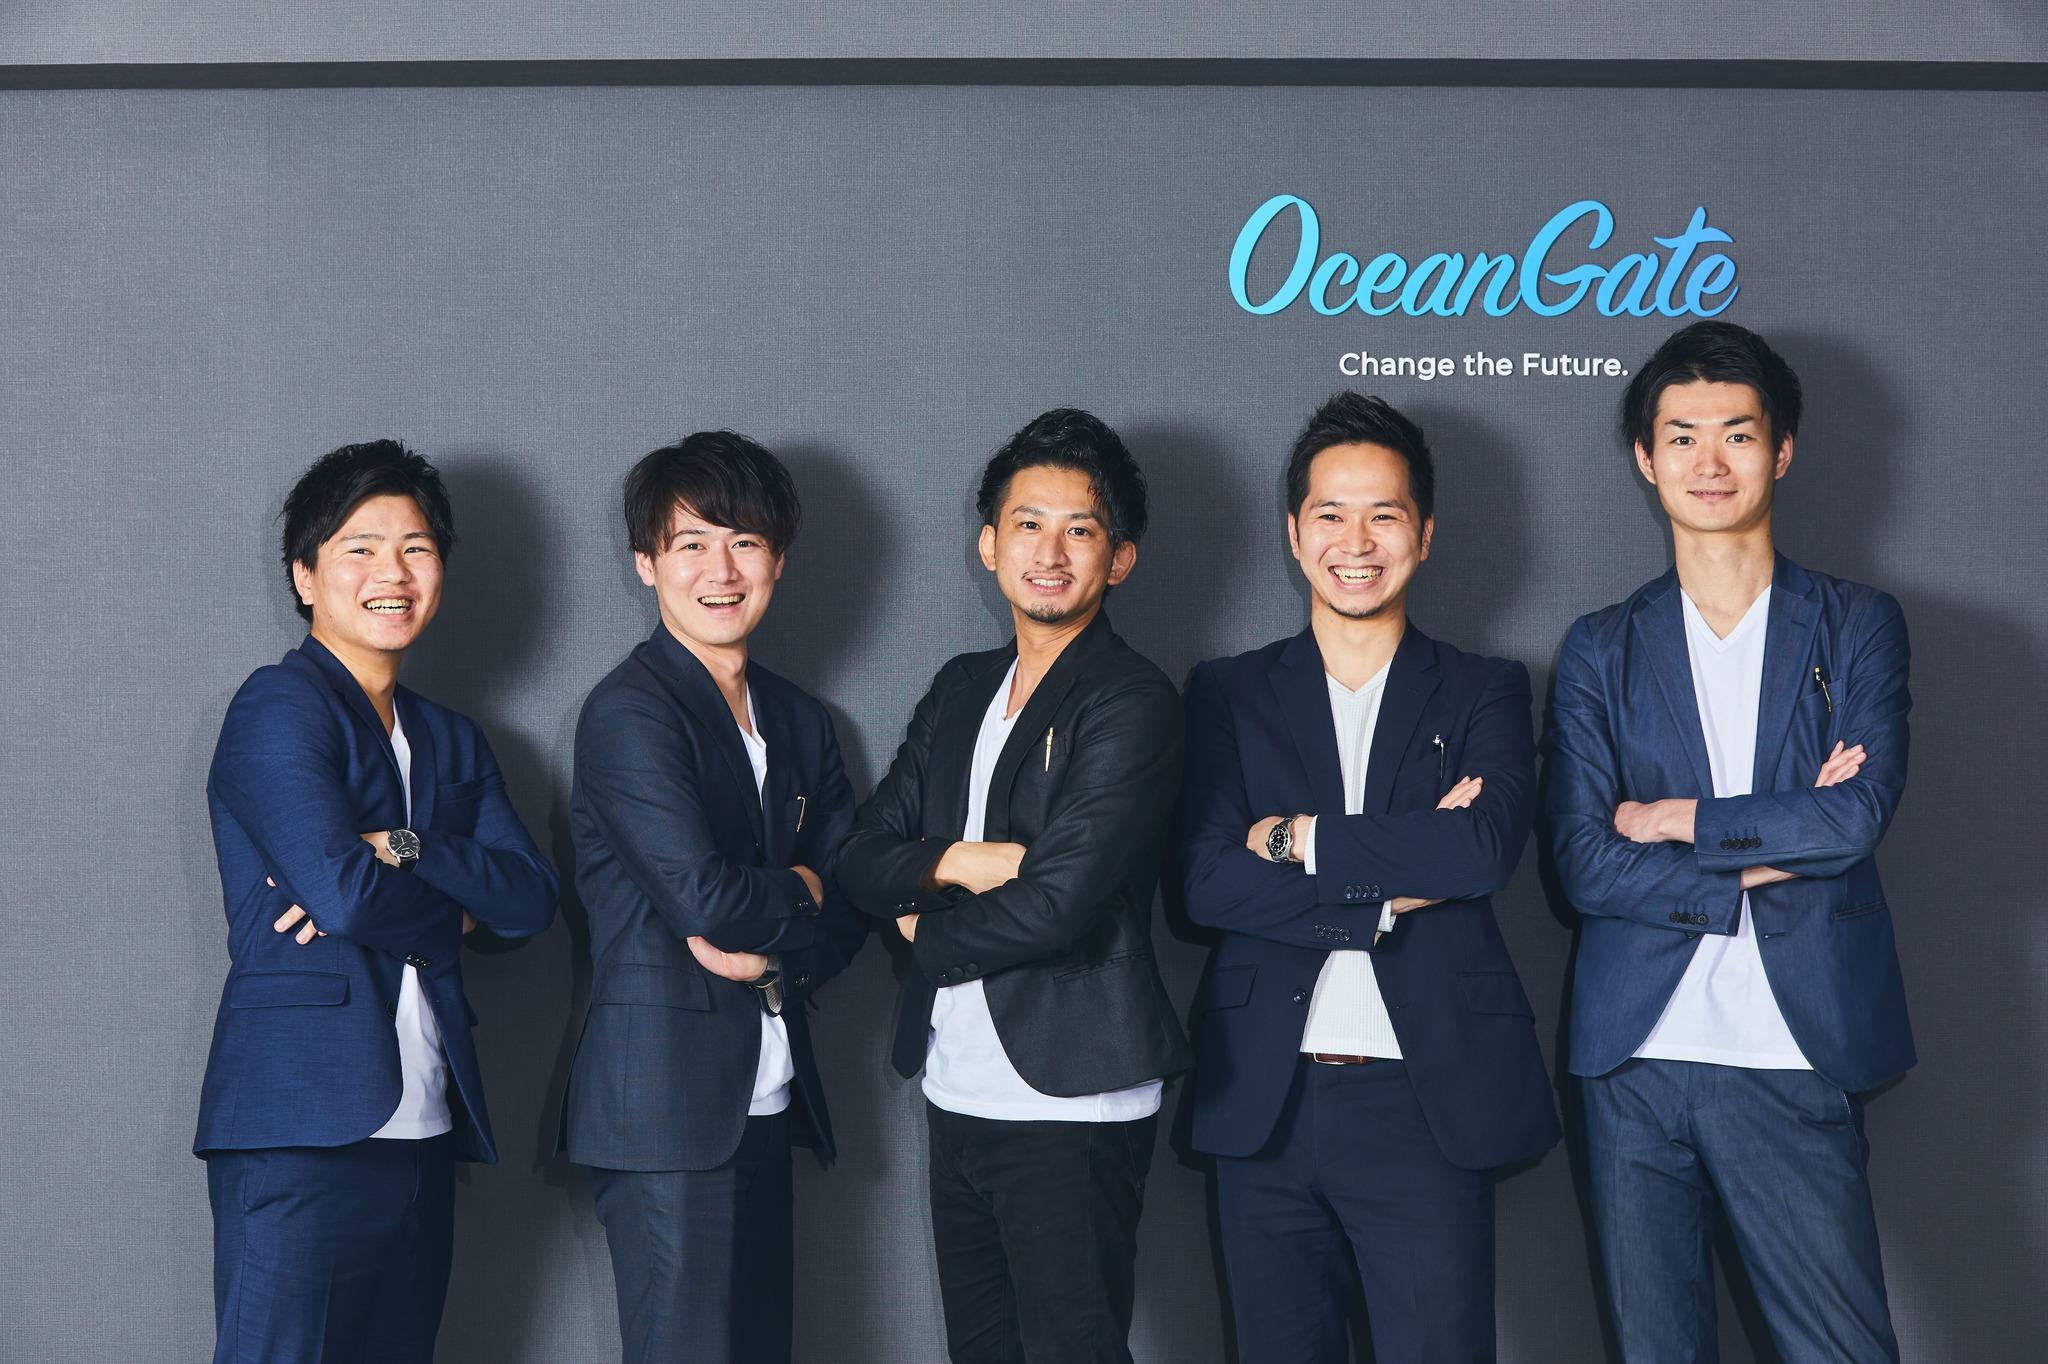 株式会社OCEAN GATE